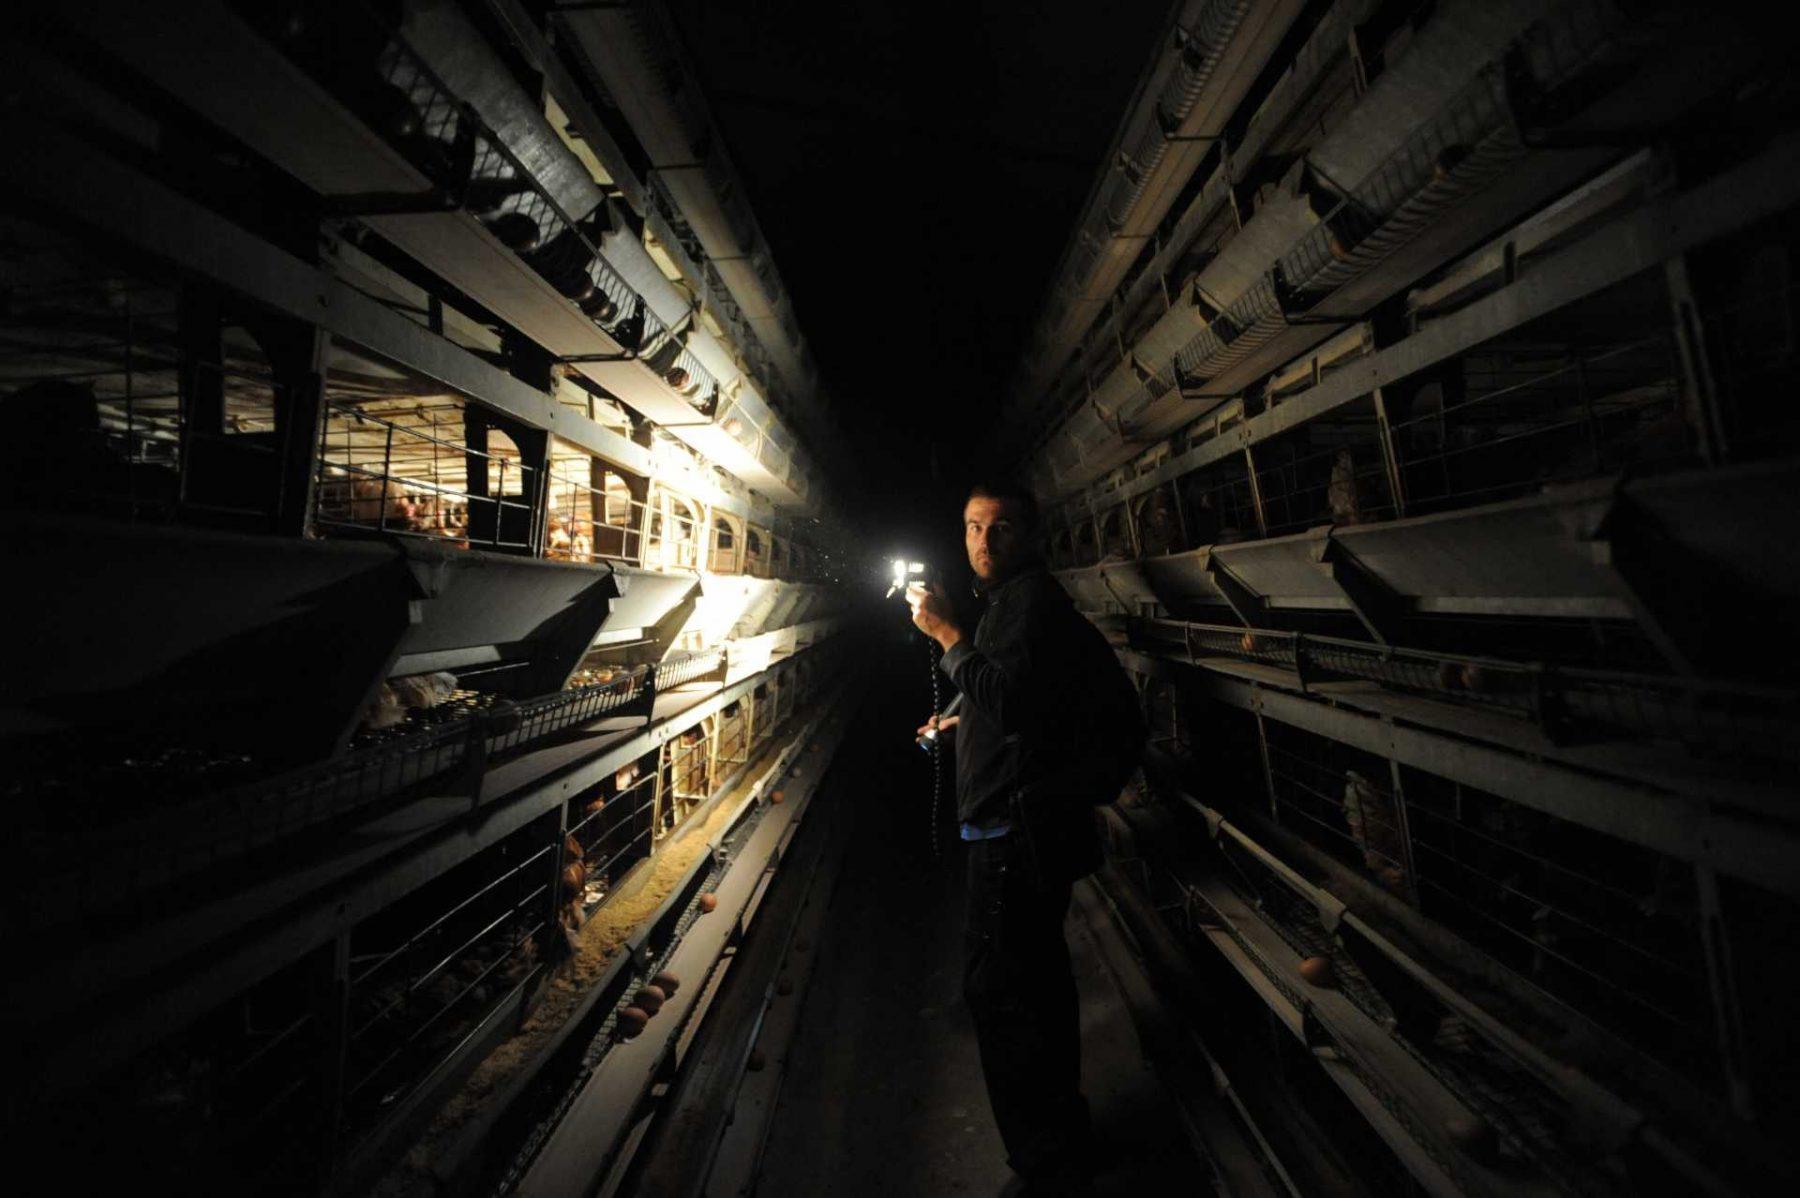 Layer hen factory farm investigation. Spain. JMcArthur / Animal Equality.